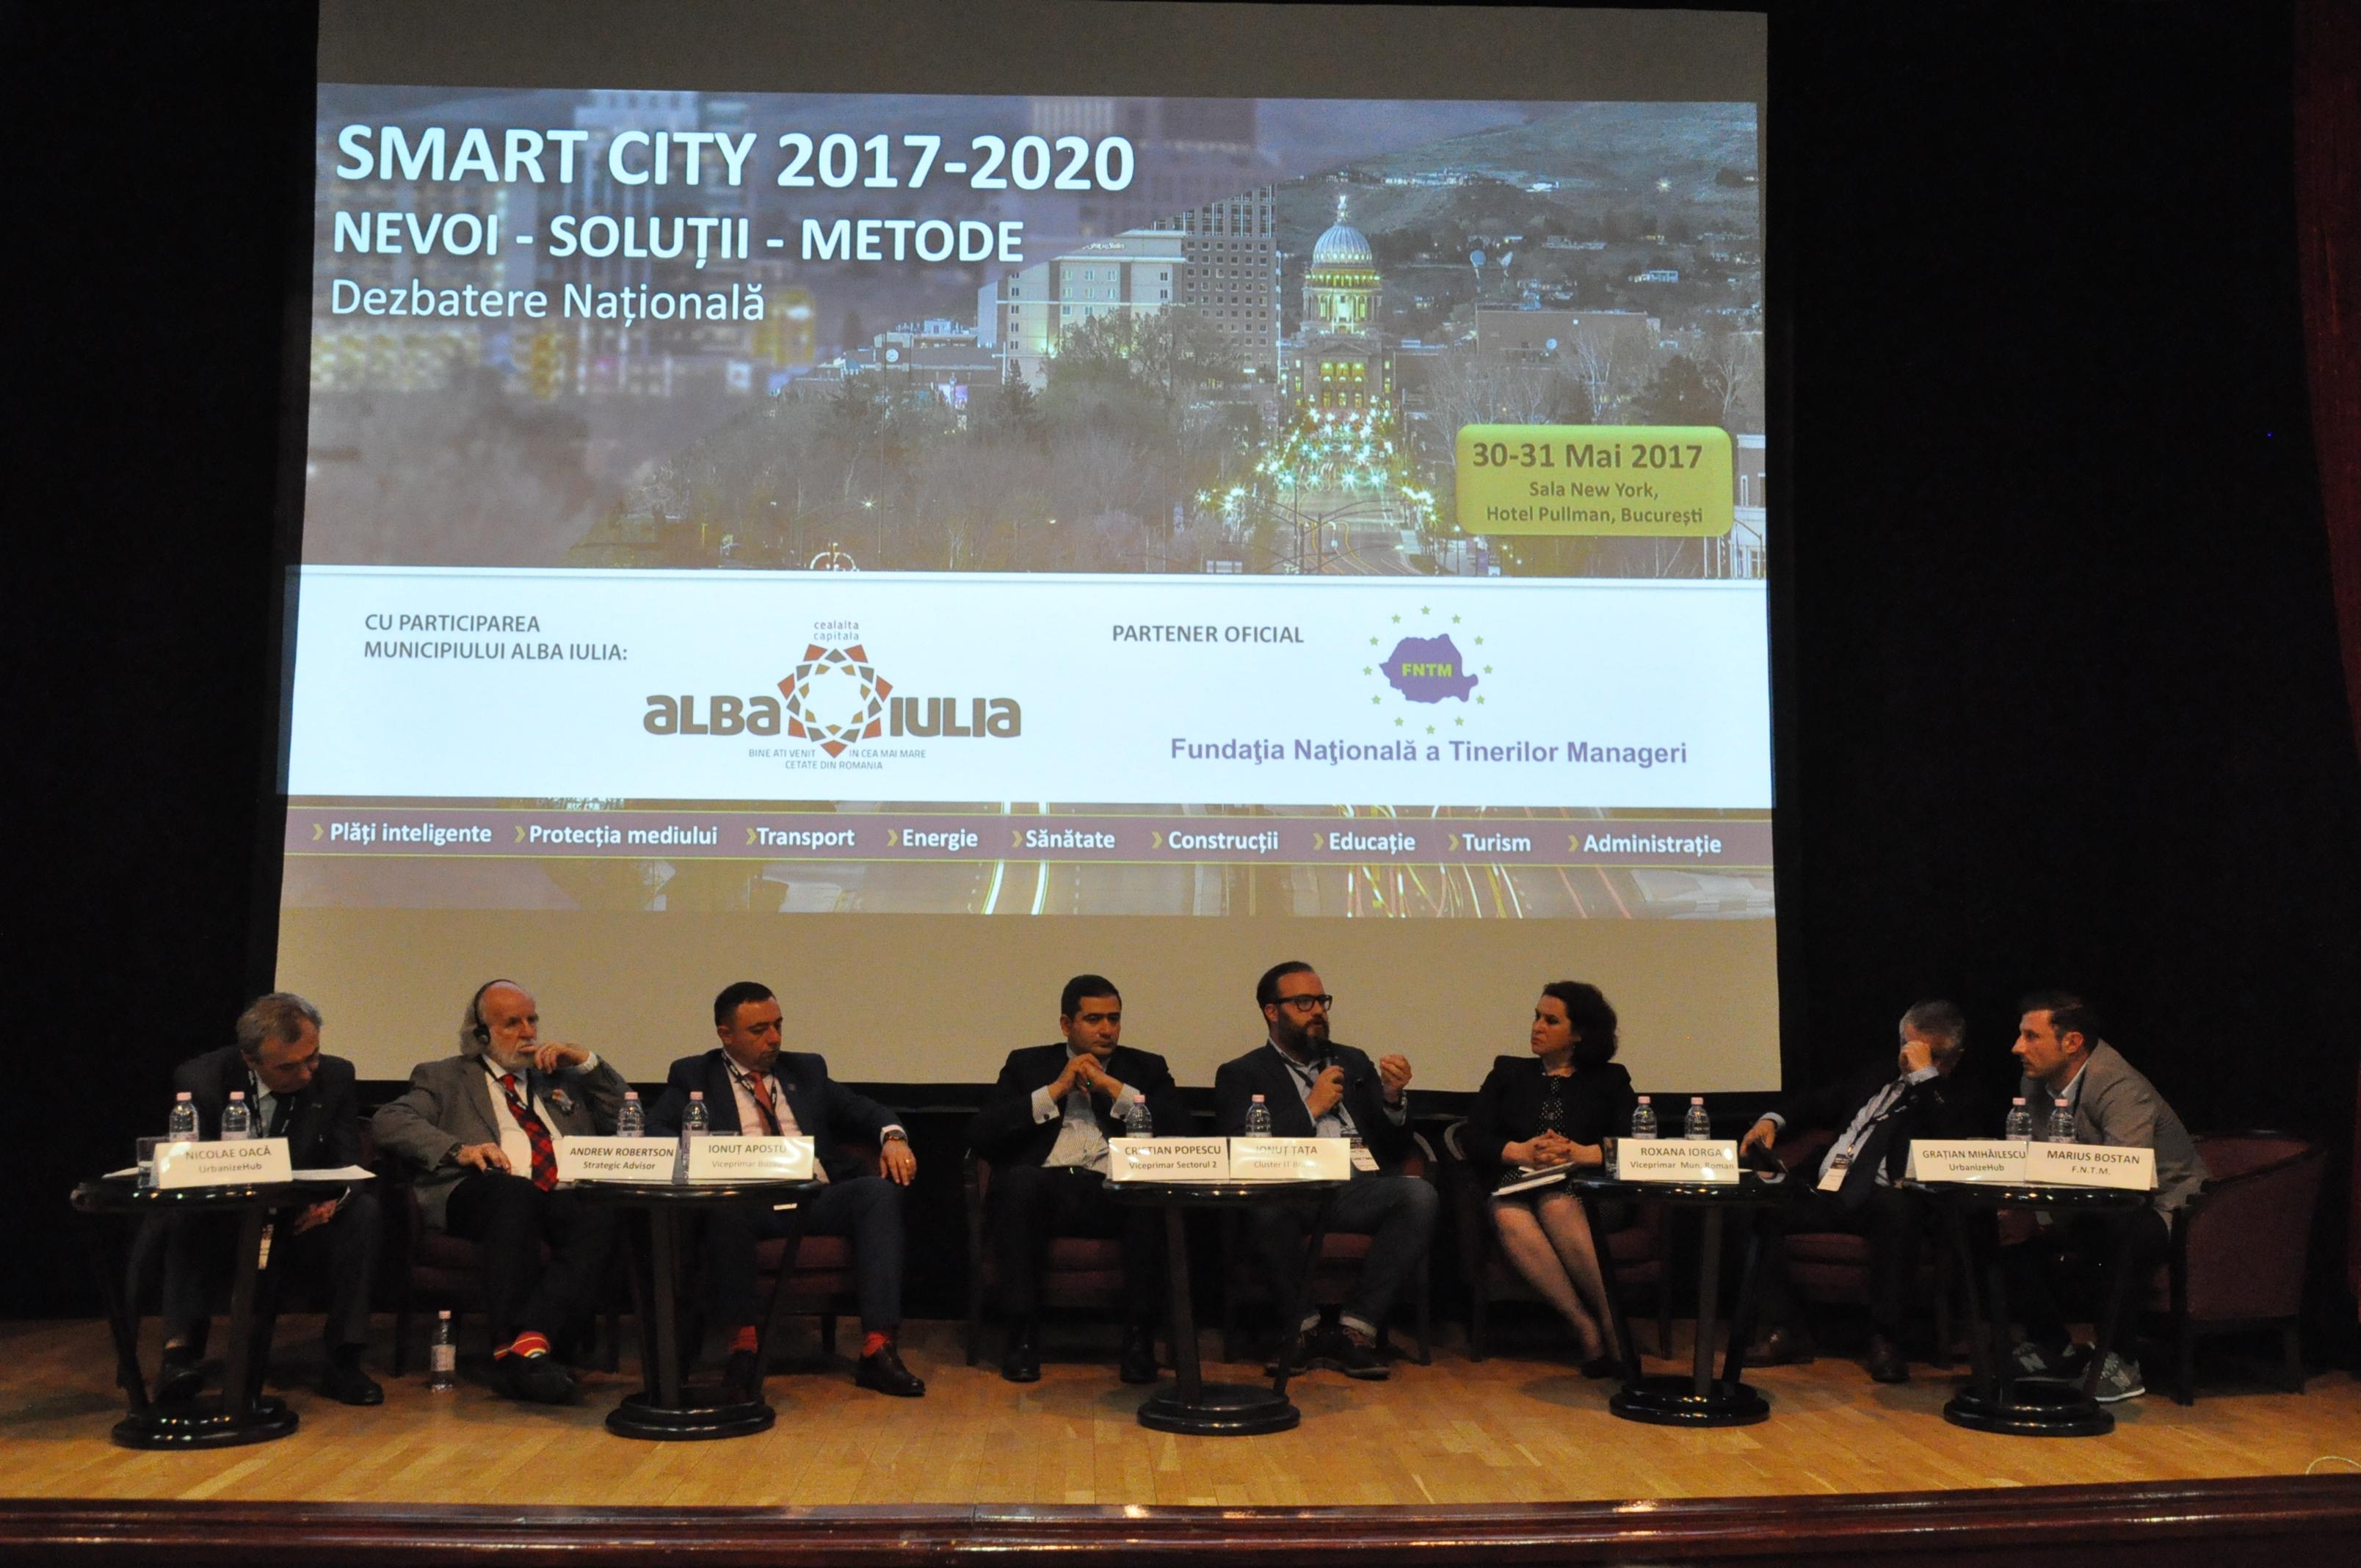 smartcity21